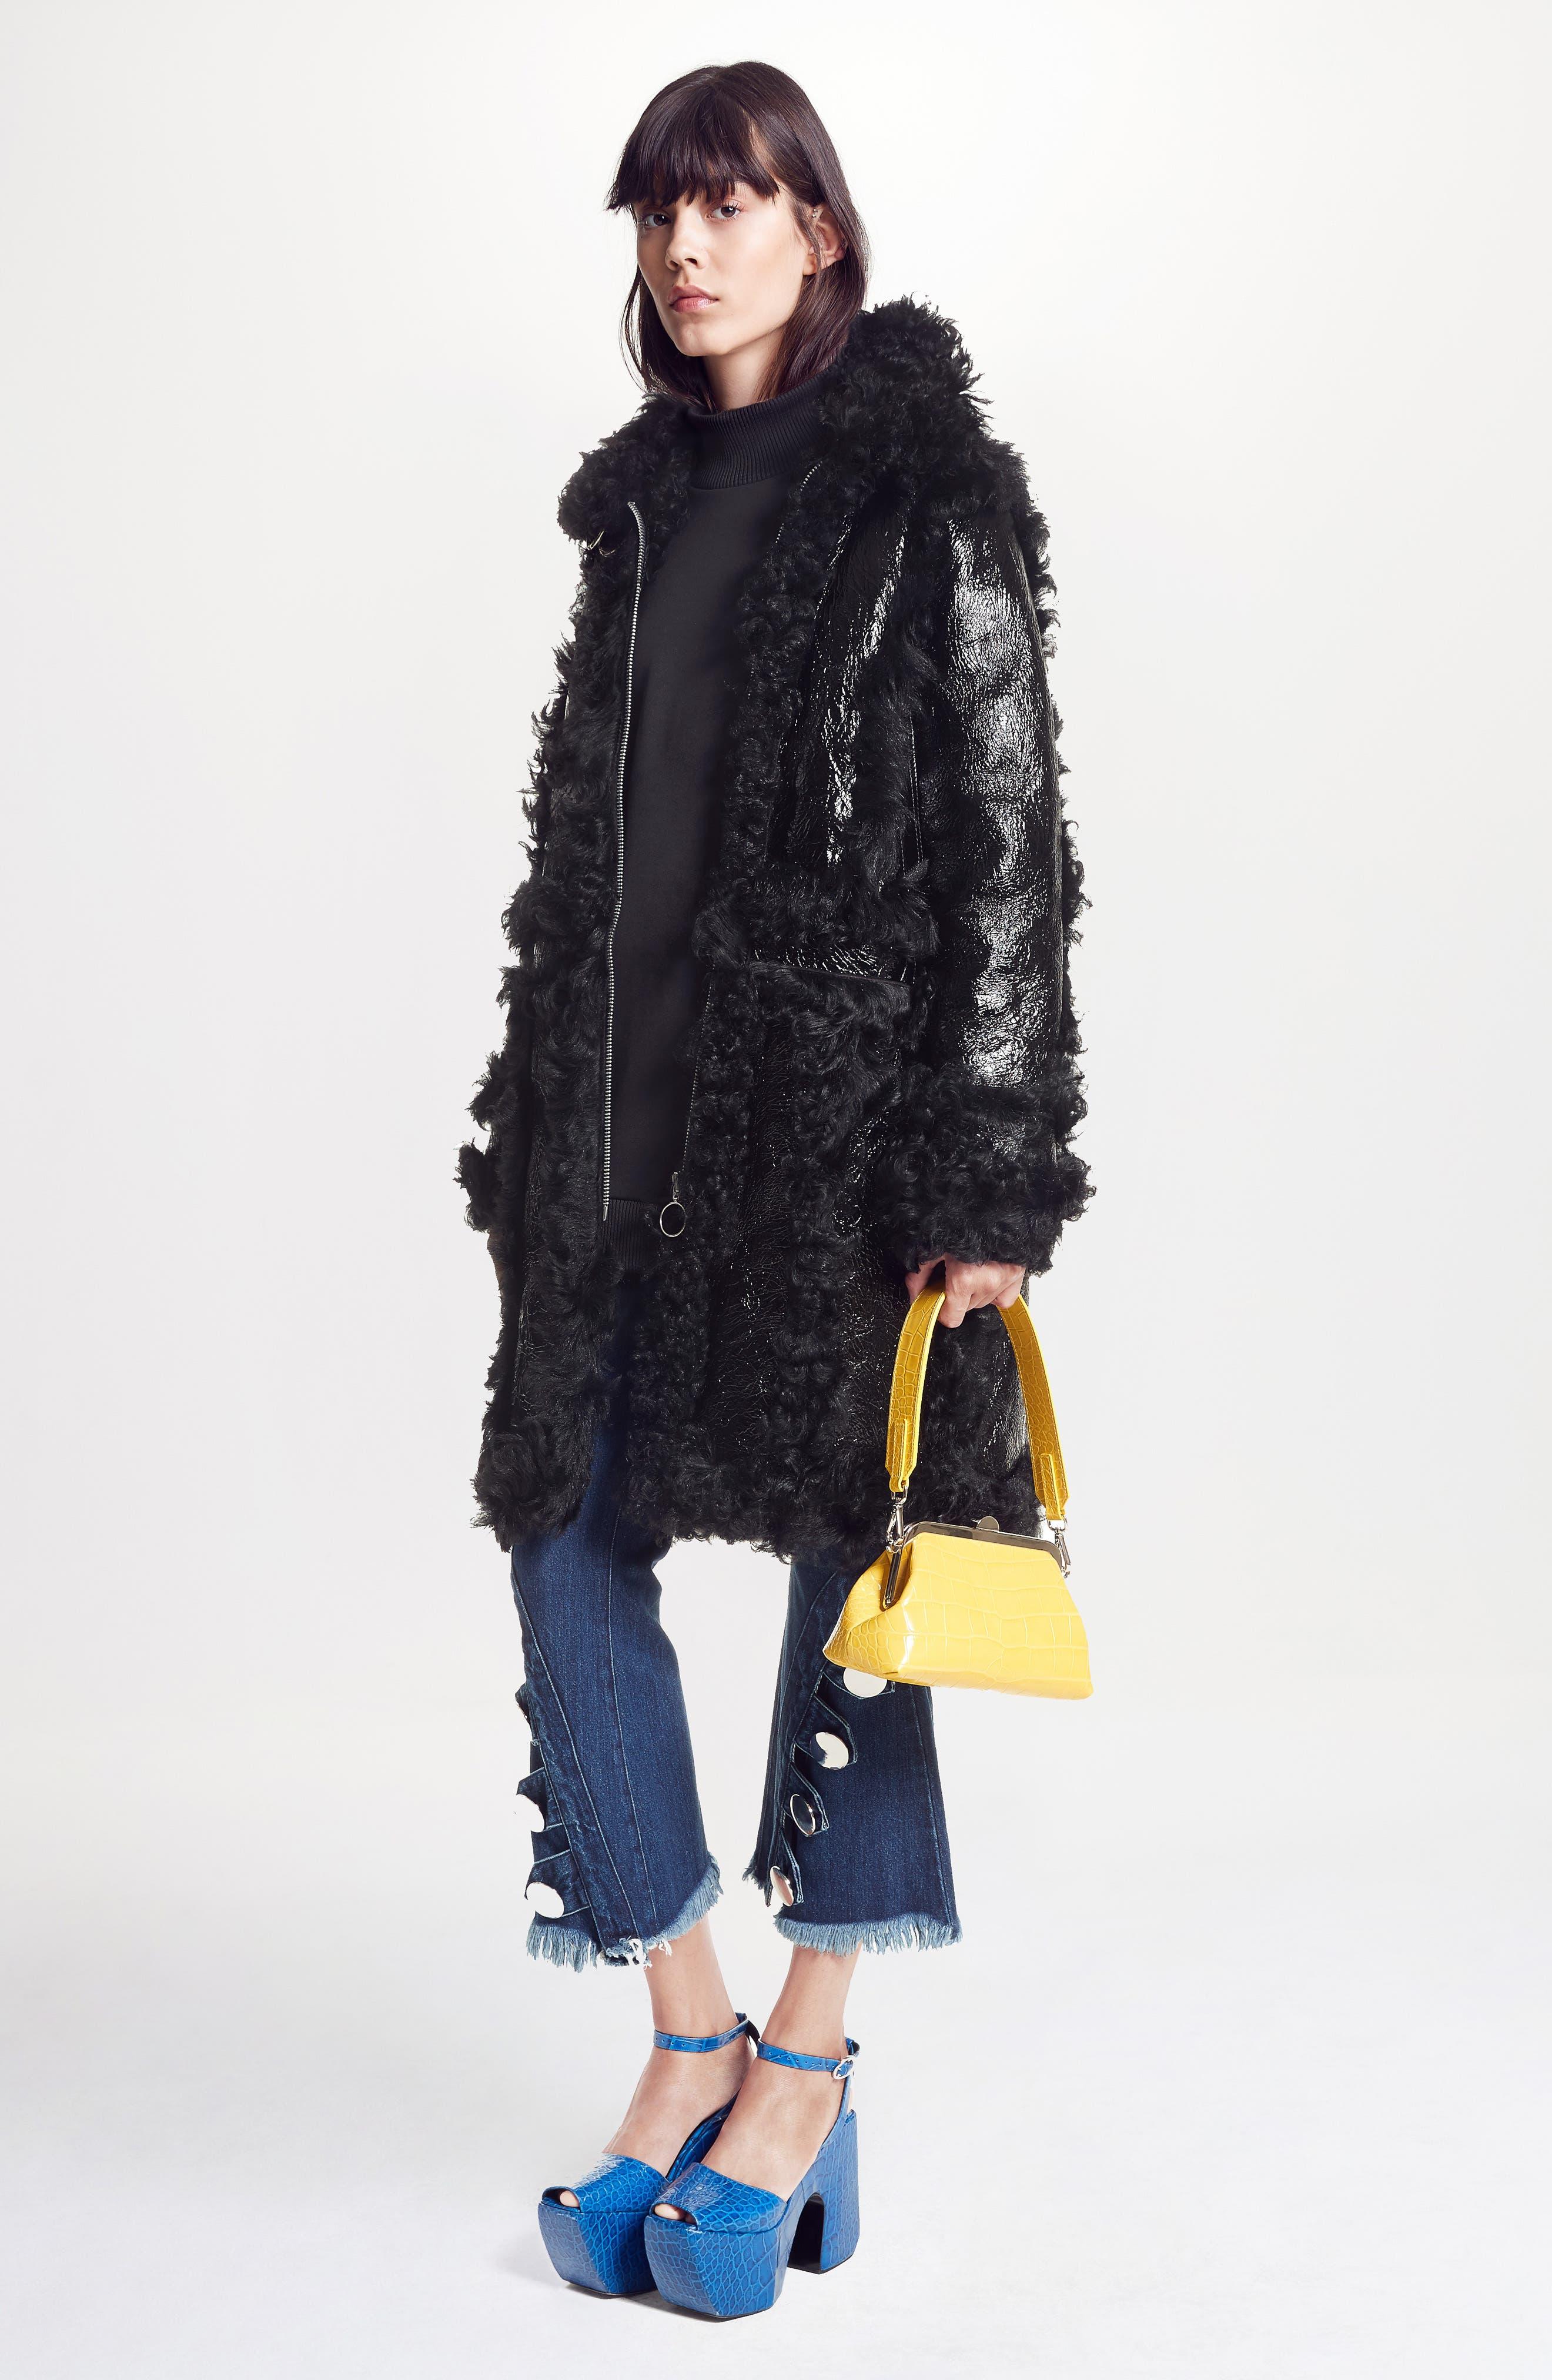 Marques'Almeida Foiled Genuine Shearling Coat,                             Alternate thumbnail 2, color,                             Black/Black